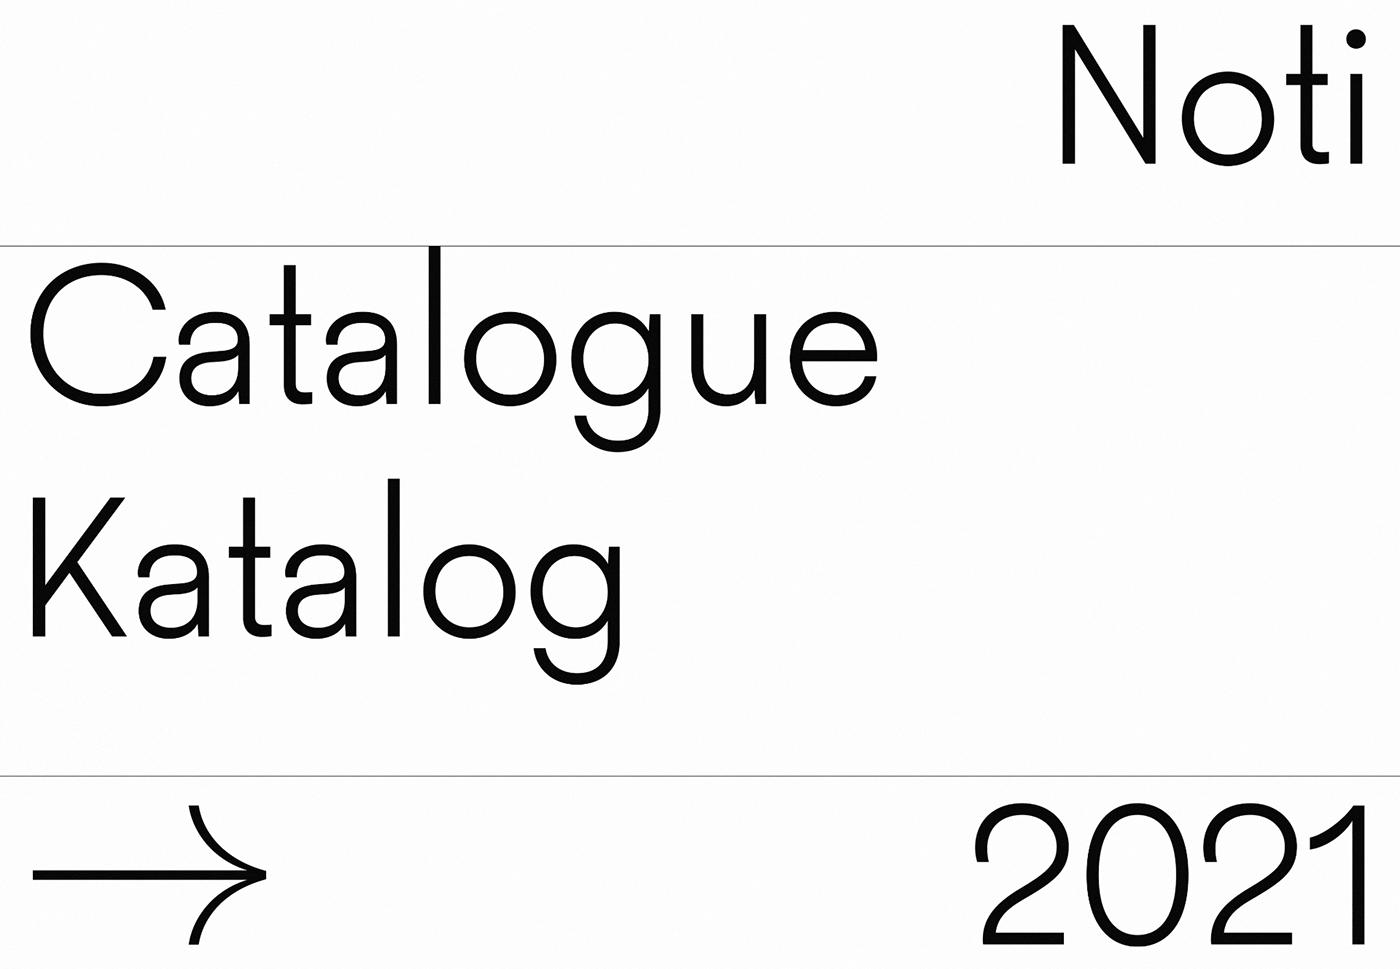 businesscatalog furniture furnituredesign Layout paper print typography